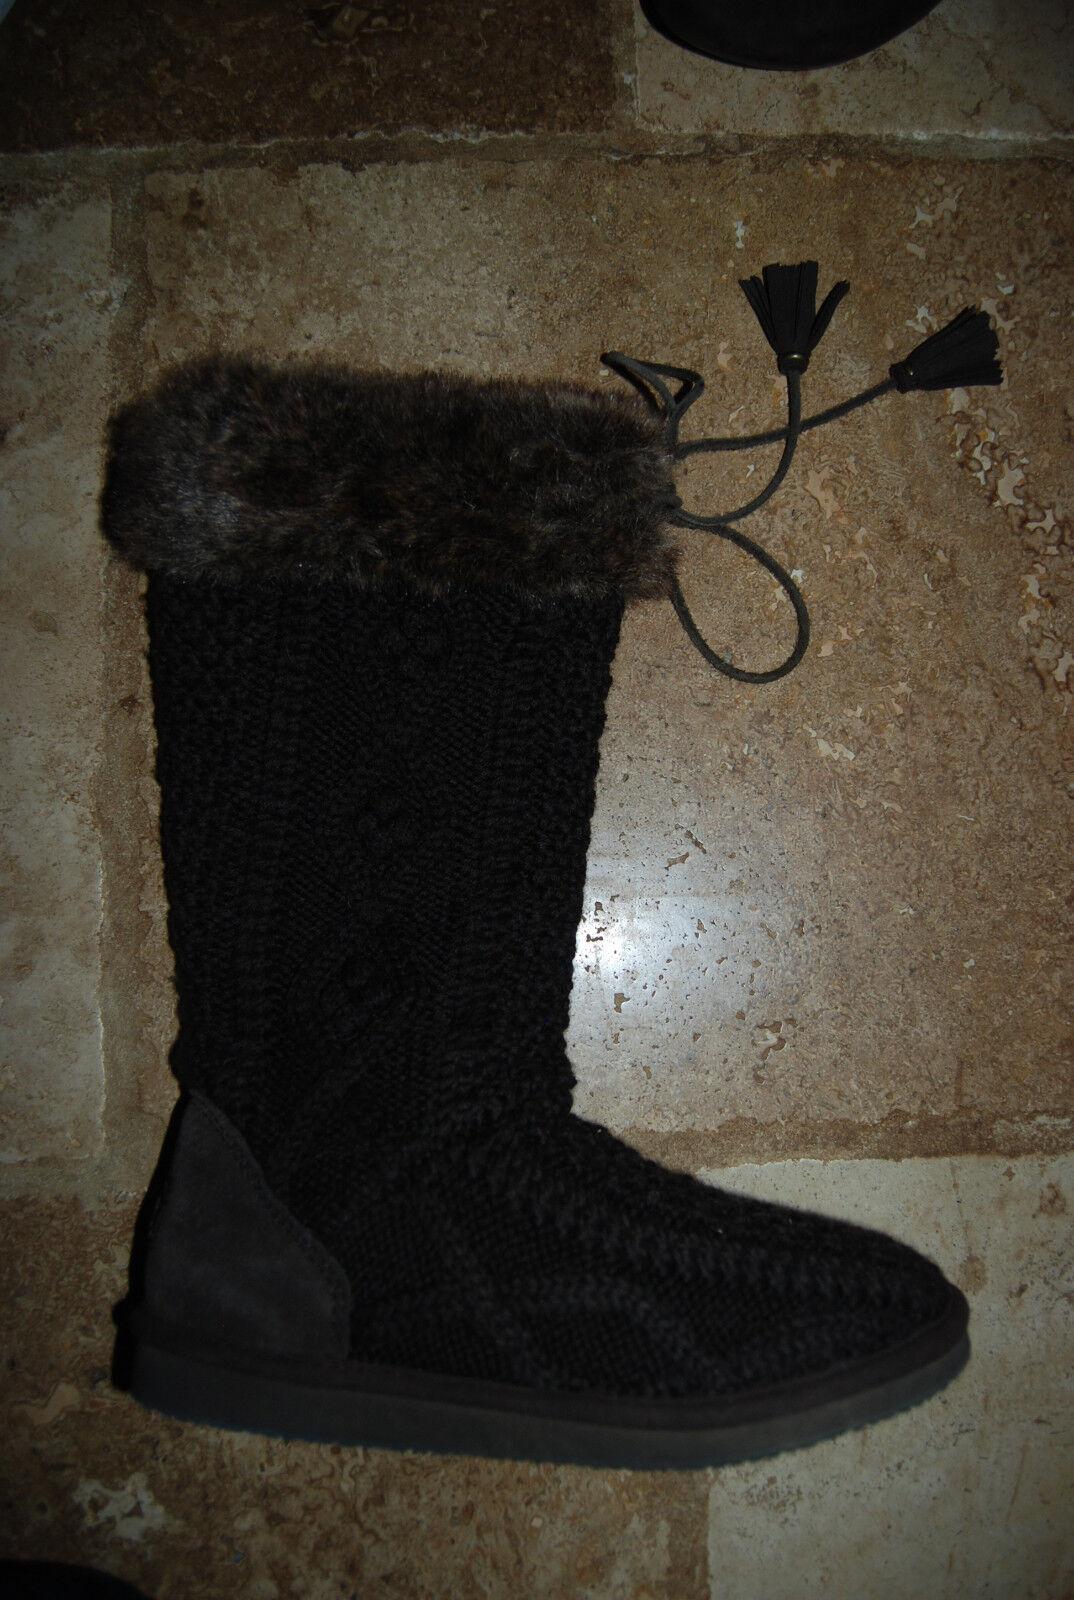 Dark Brown Cable Knit LL BEAN Tall Boots w/Faur Fur 7 Trim Worn Once US 7 Fur 00d807